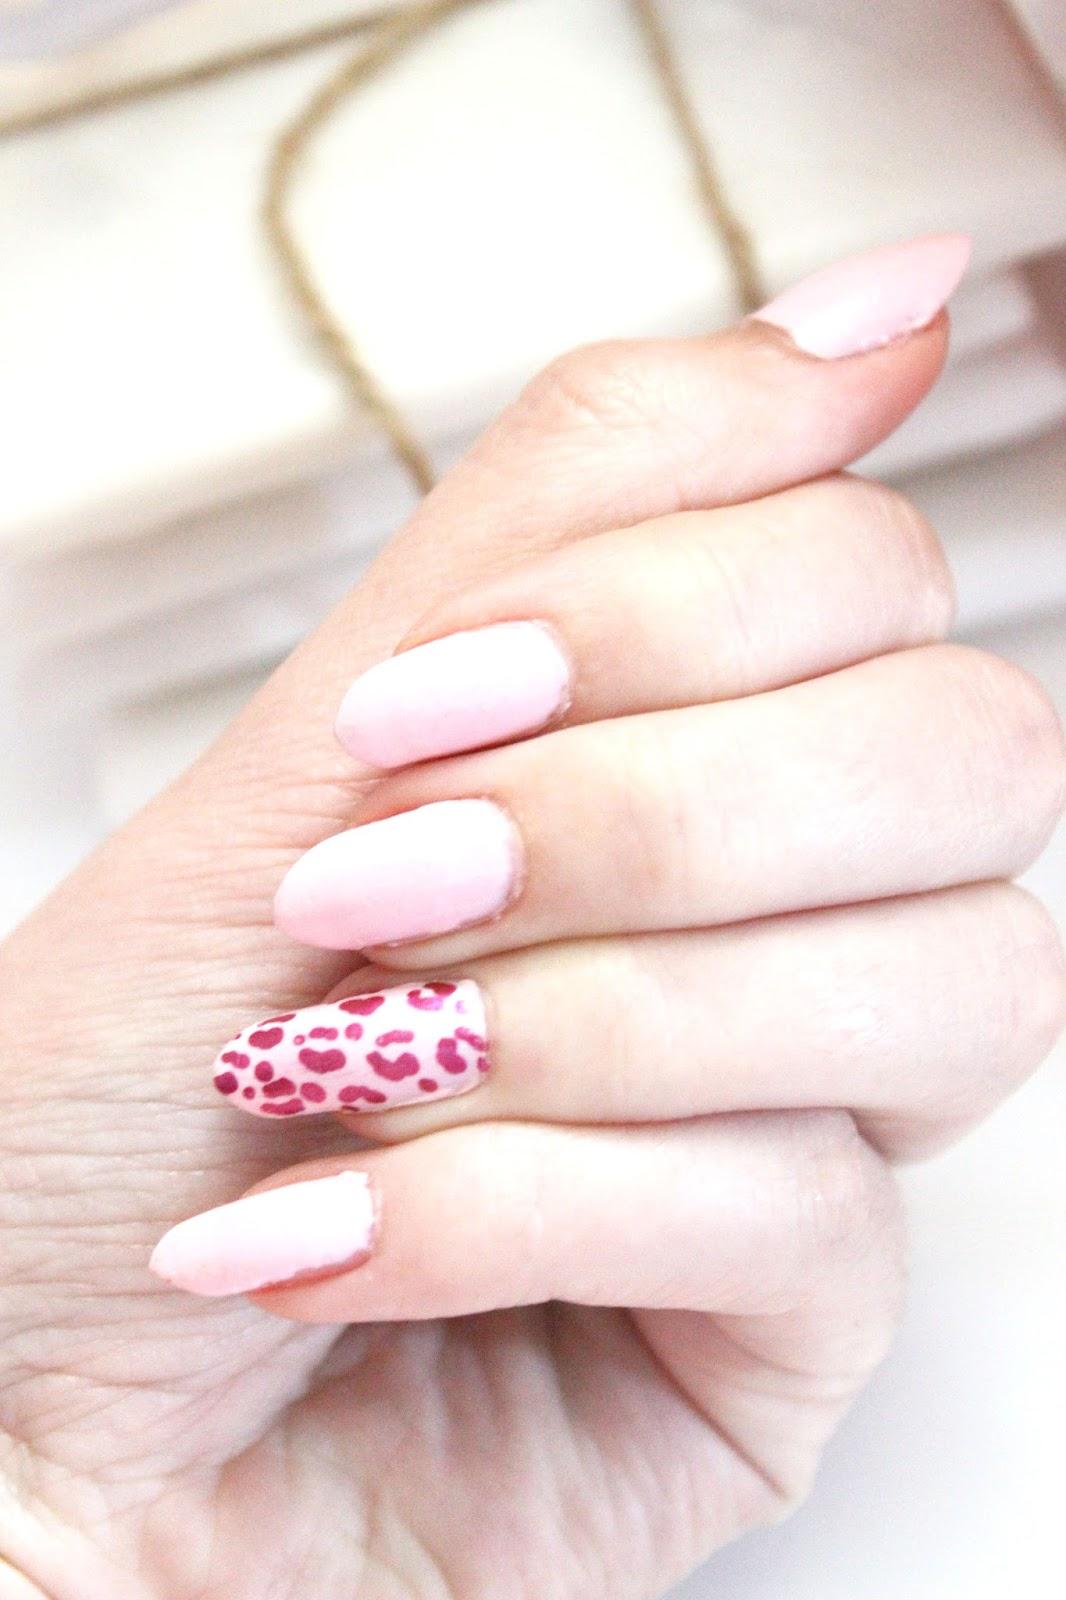 MAK | A Style + Beauty Blog by Mikayla Ann Kuehn: September 2015